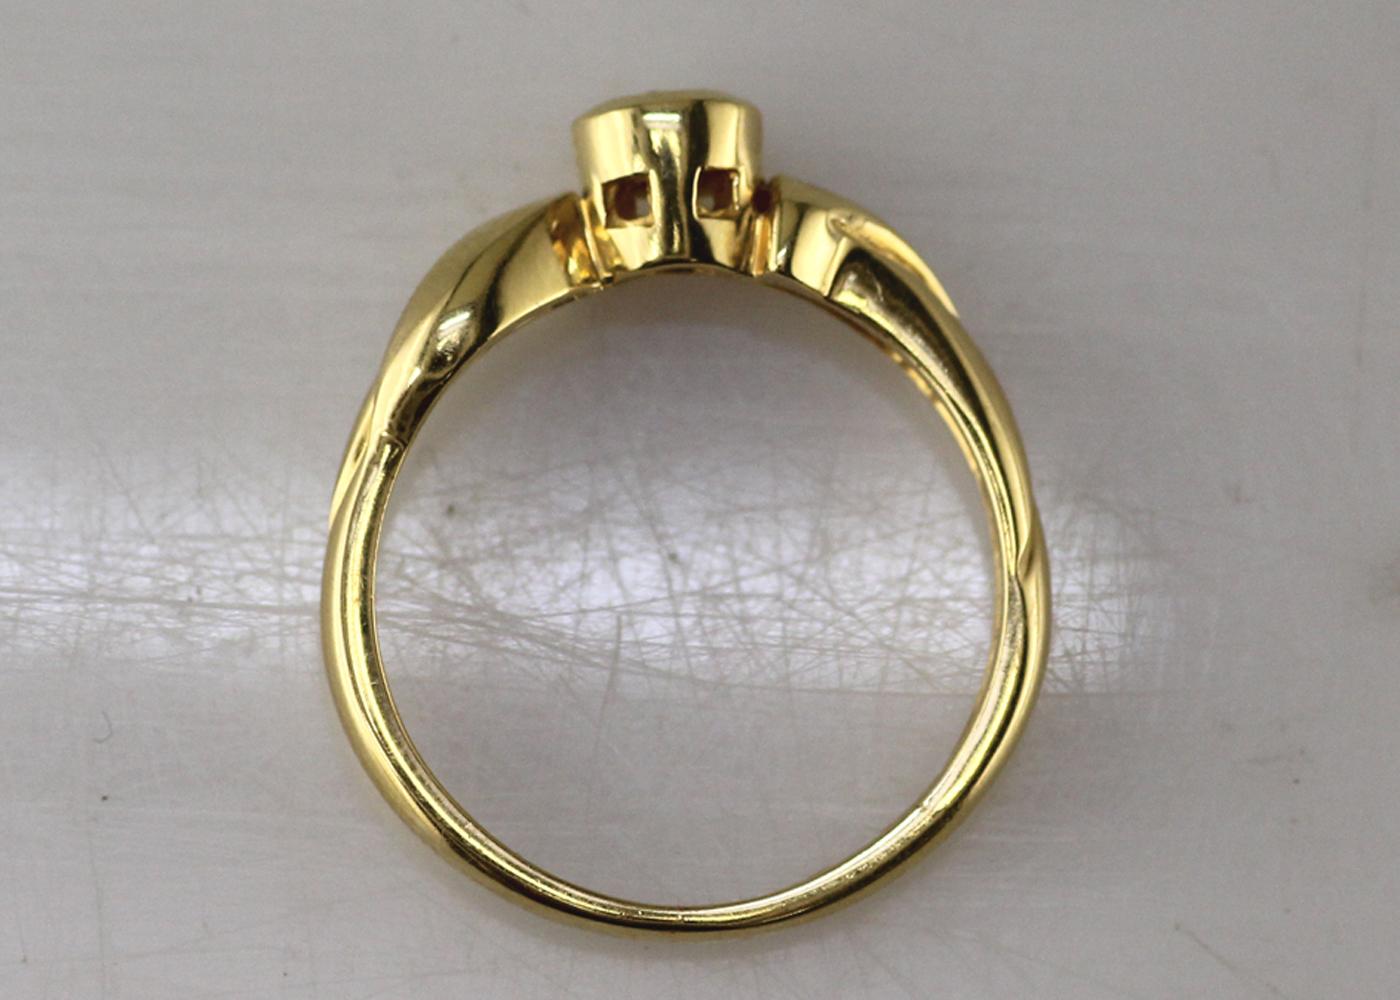 18ct Rub Over Set Diamond Ring 0.17 Carats - Image 6 of 7